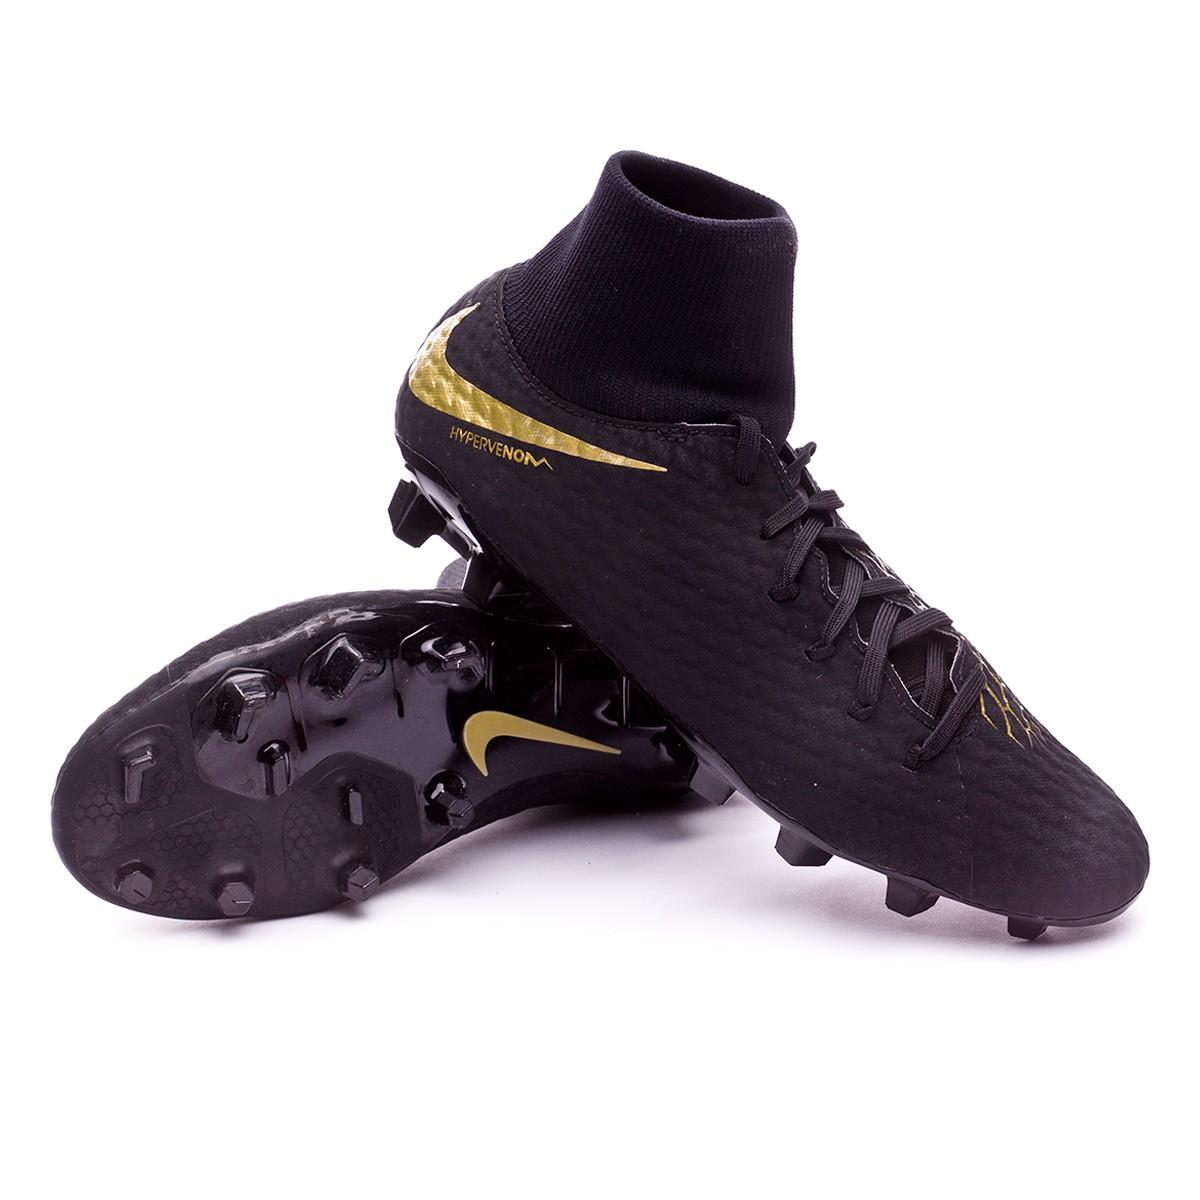 5d112a3c1b3 Football Boots Nike Hypervenom Phantom III Academy DF FG Black ...